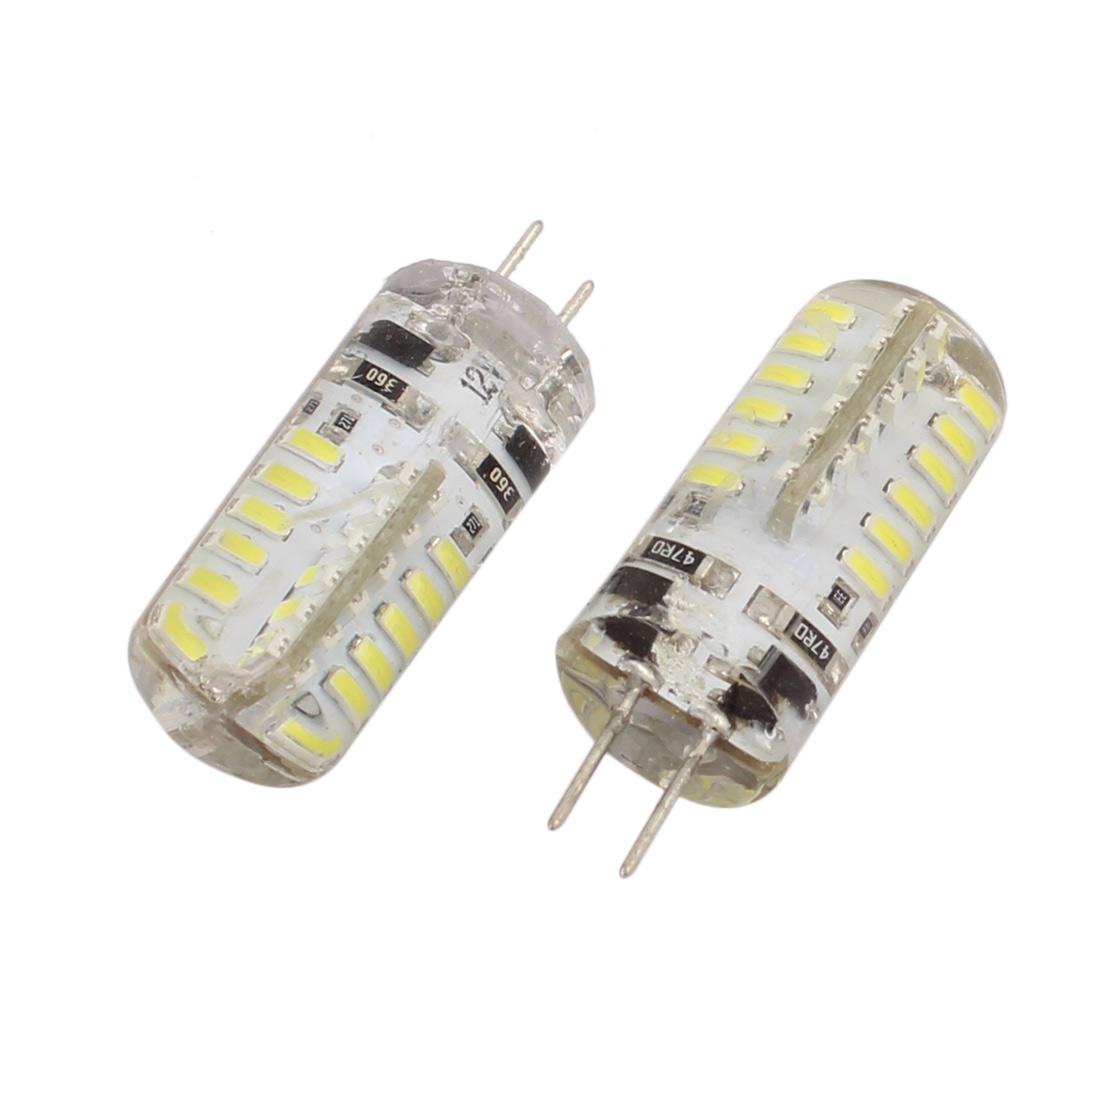 2Pcs DC 12V 3W G4 3014SMD LED Corn Light Bulb 48-LED Silicone Lamp Neutral White